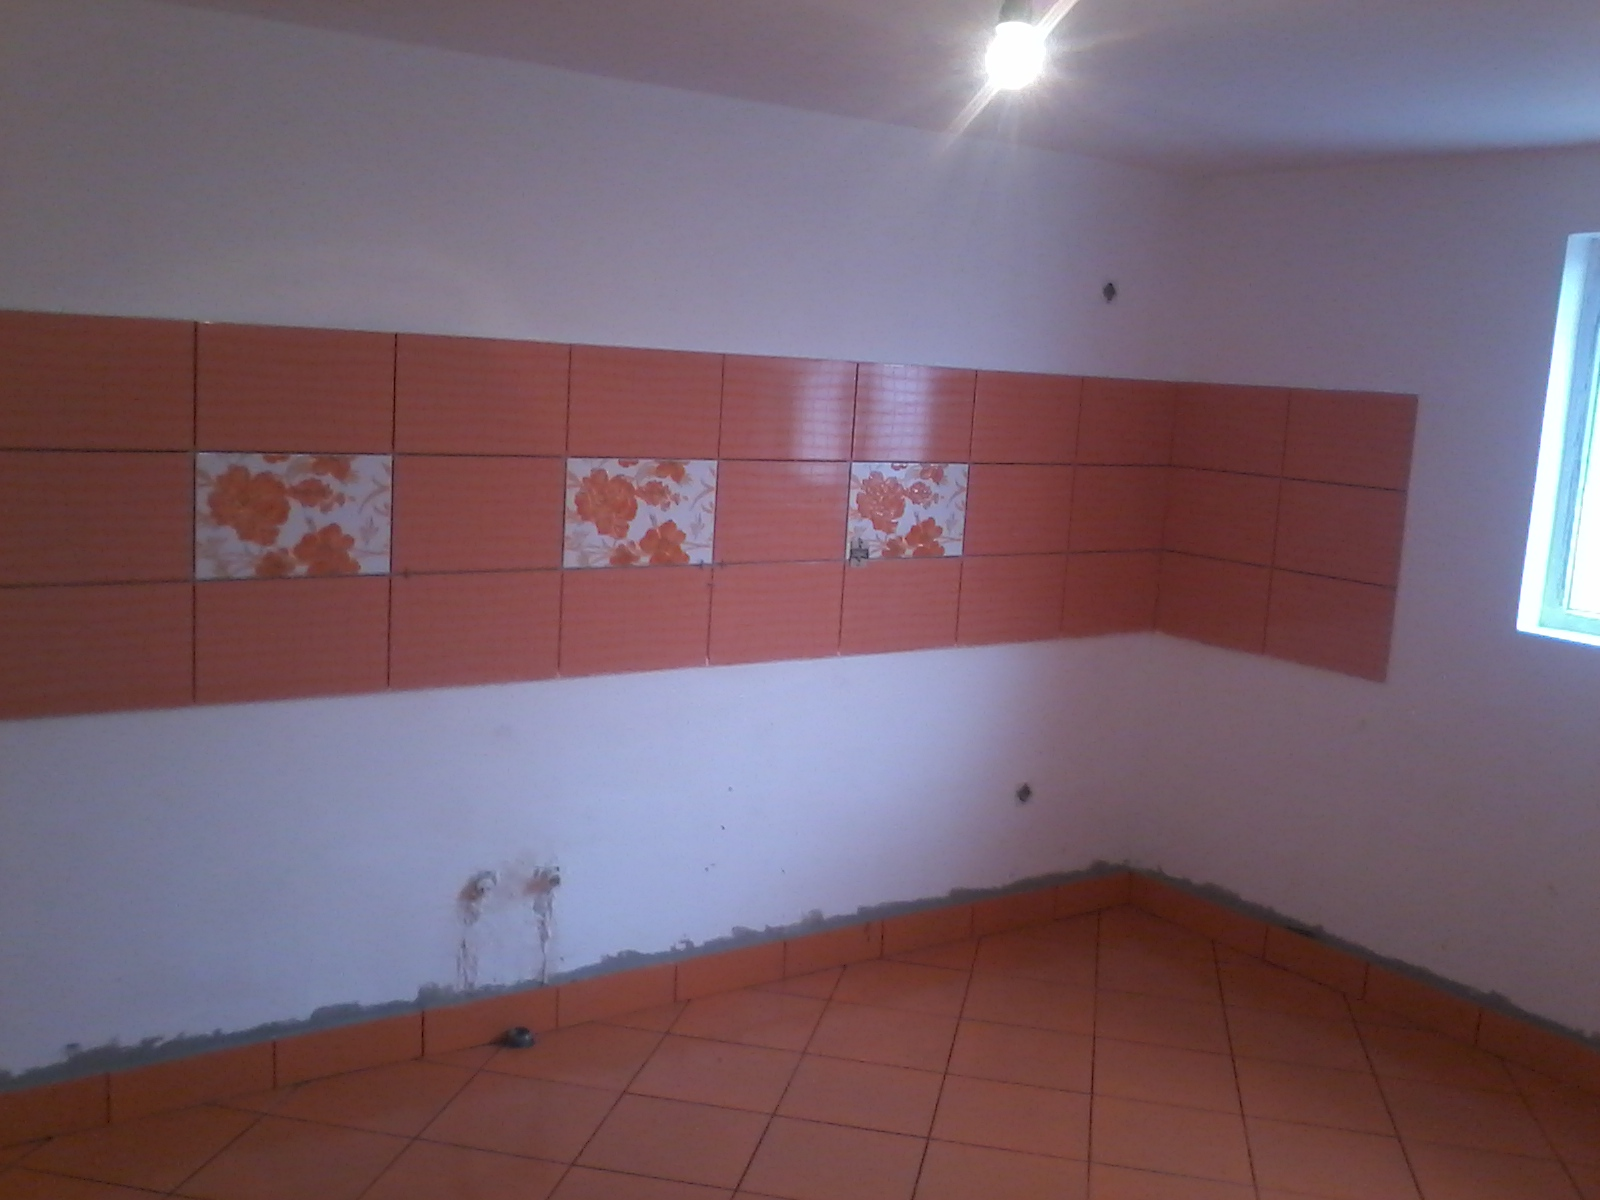 How To Interior Decorate Laconstructii Com Bucatarie Cu Faianta Portocalie In